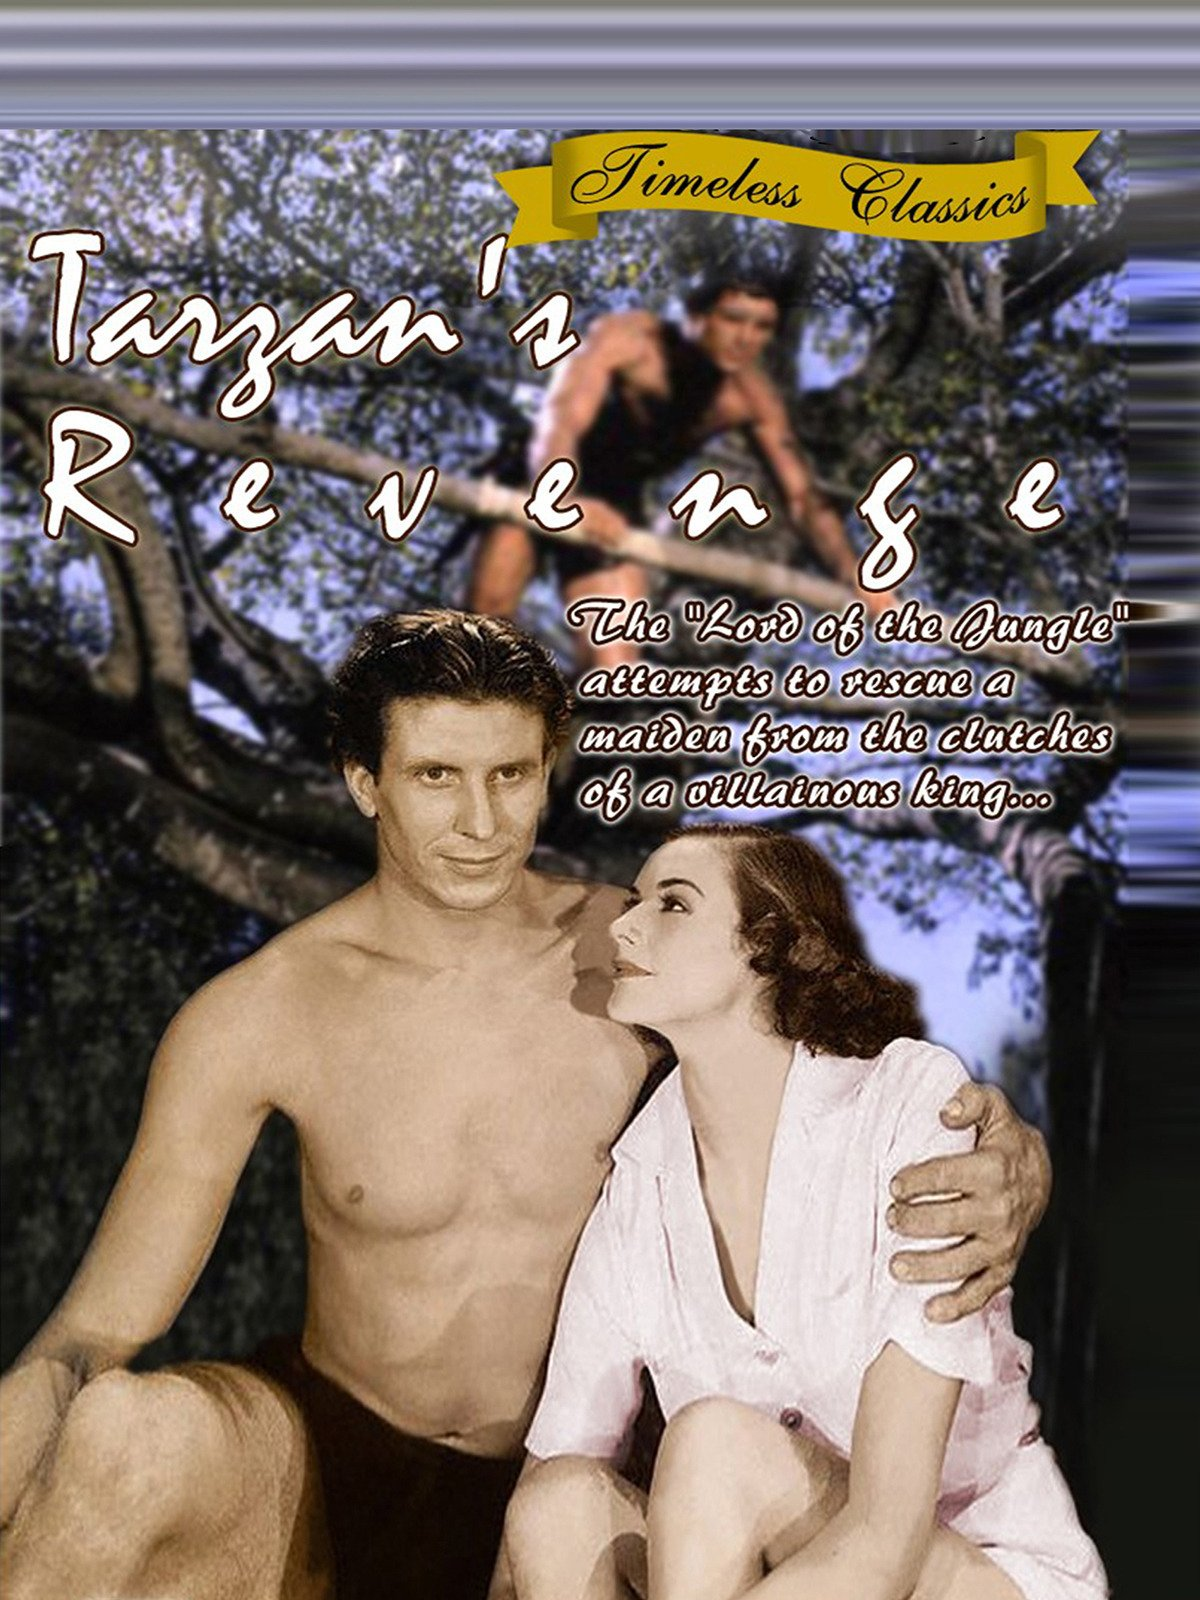 Tarzan's Revenge - 1938 - Remastered Edition